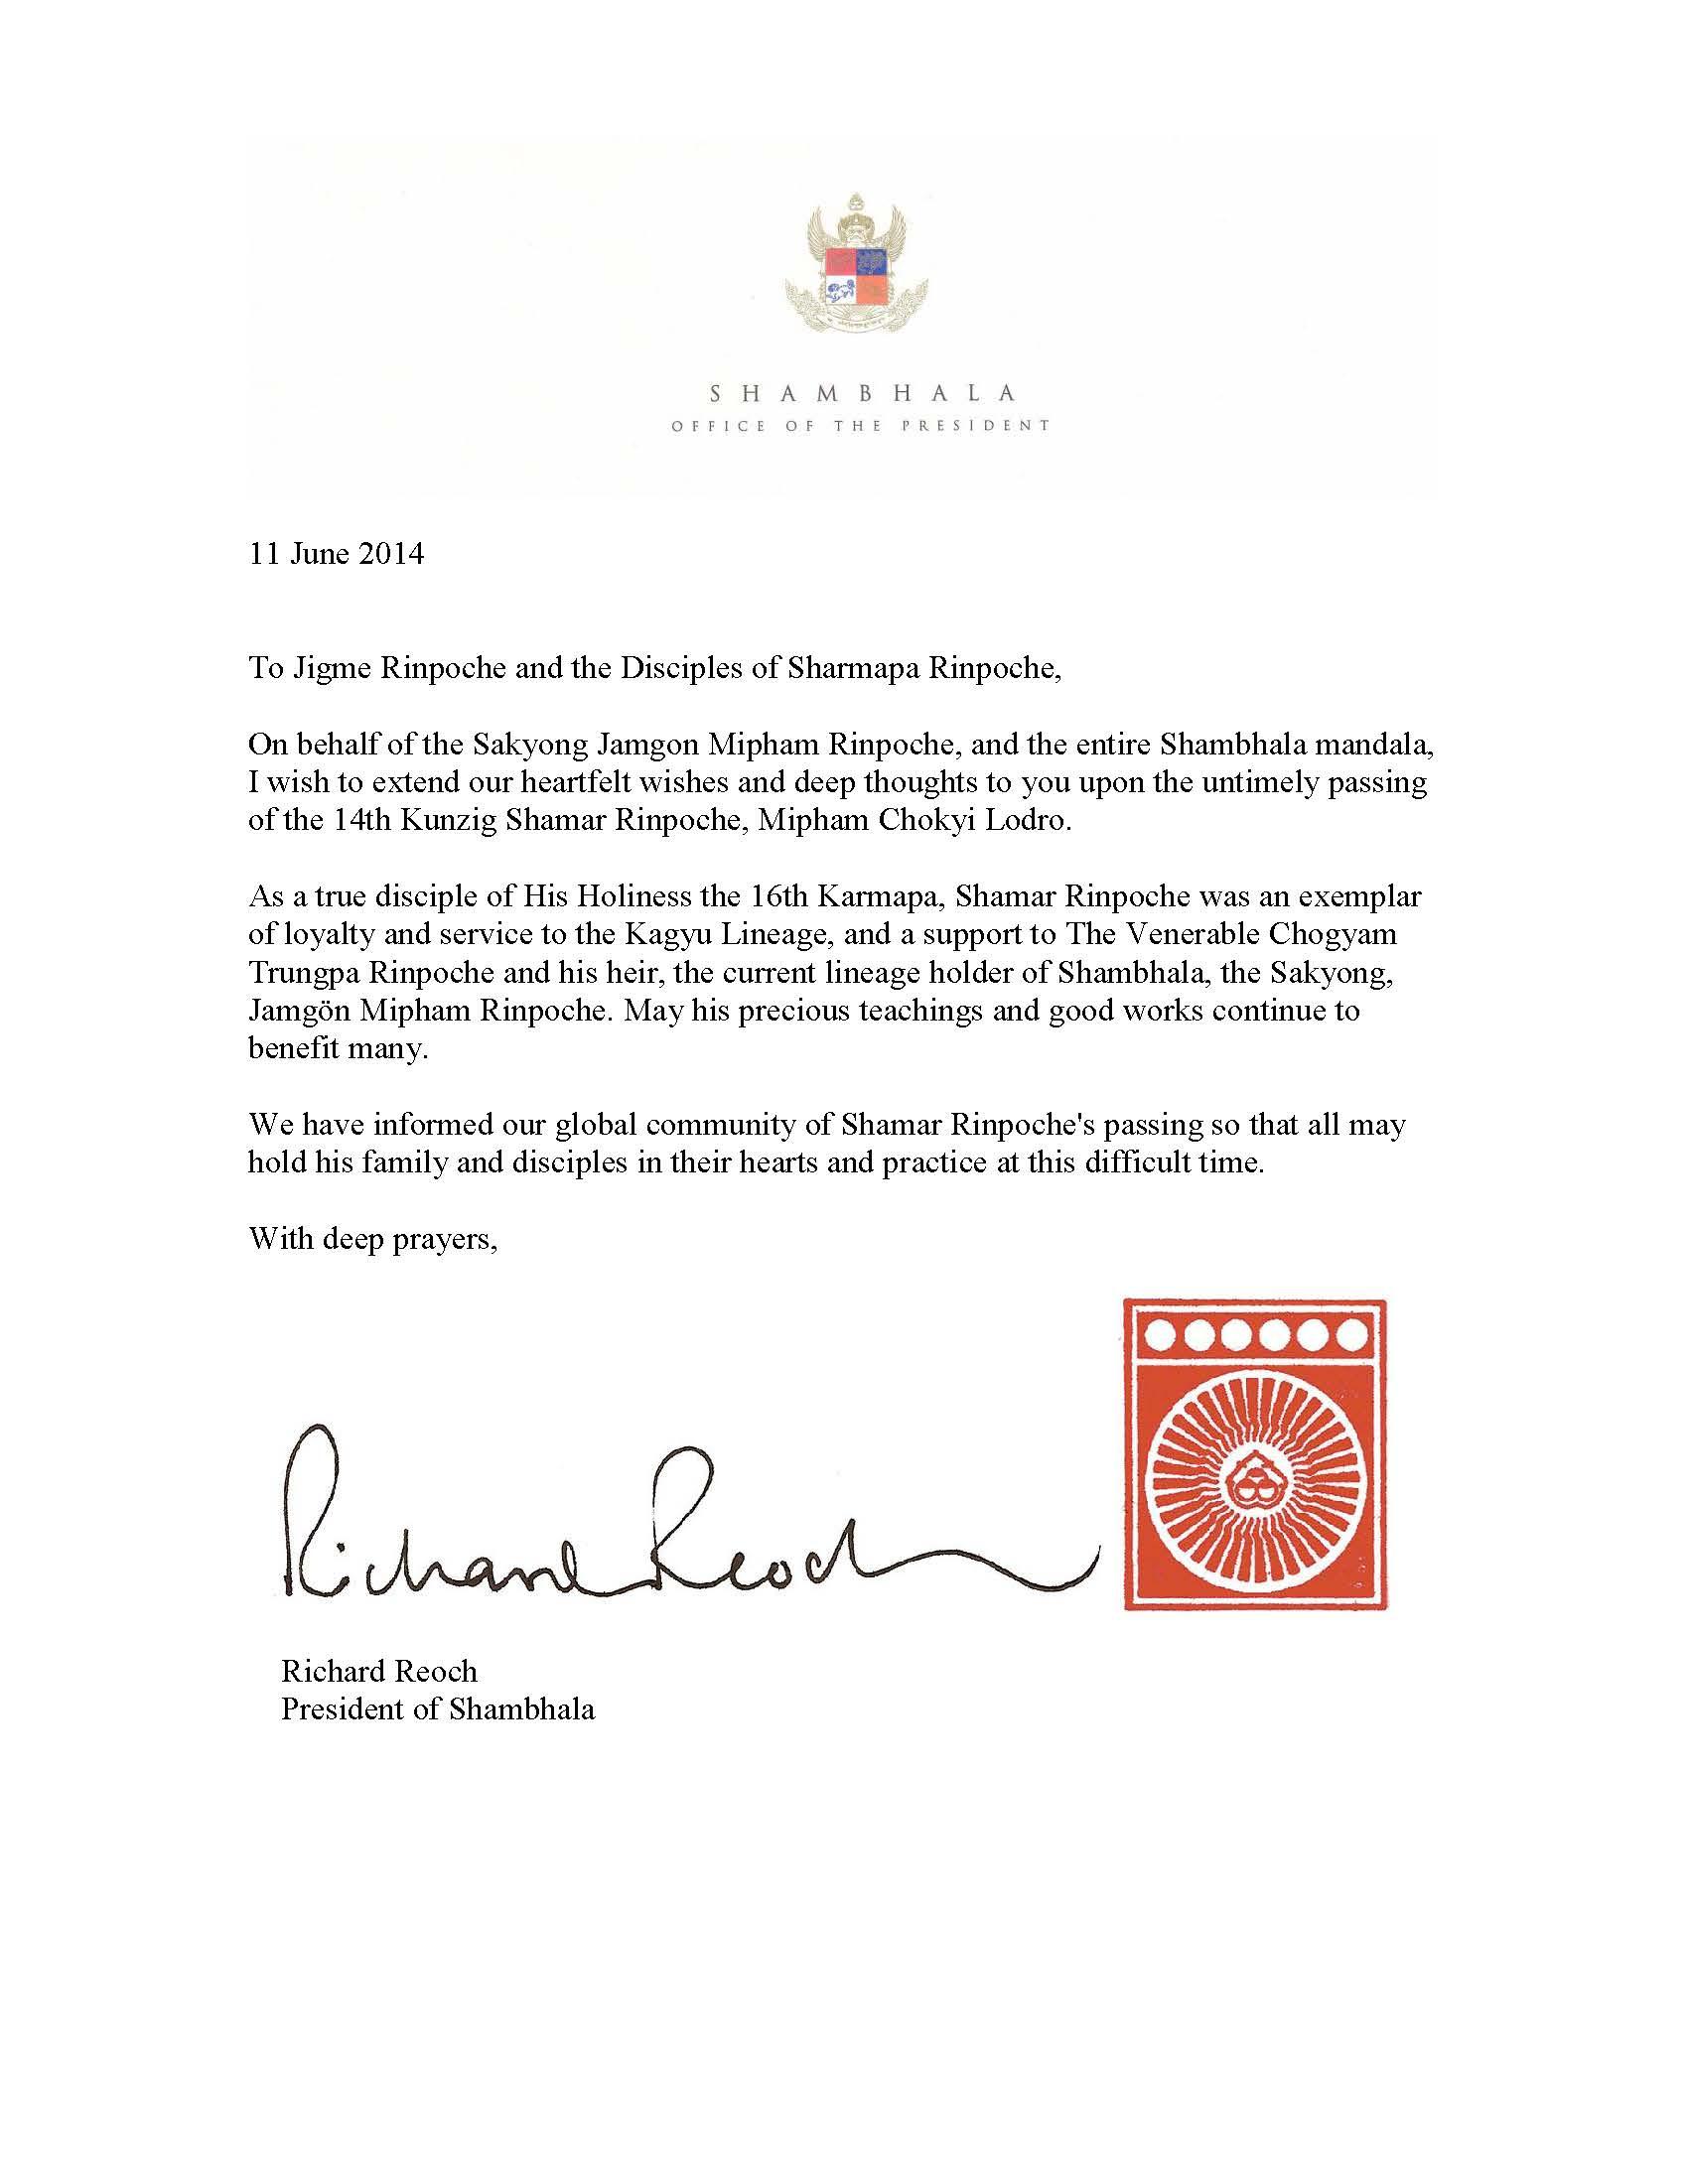 letter of condolence for death condolence letter death business – Condolence Letter Sample